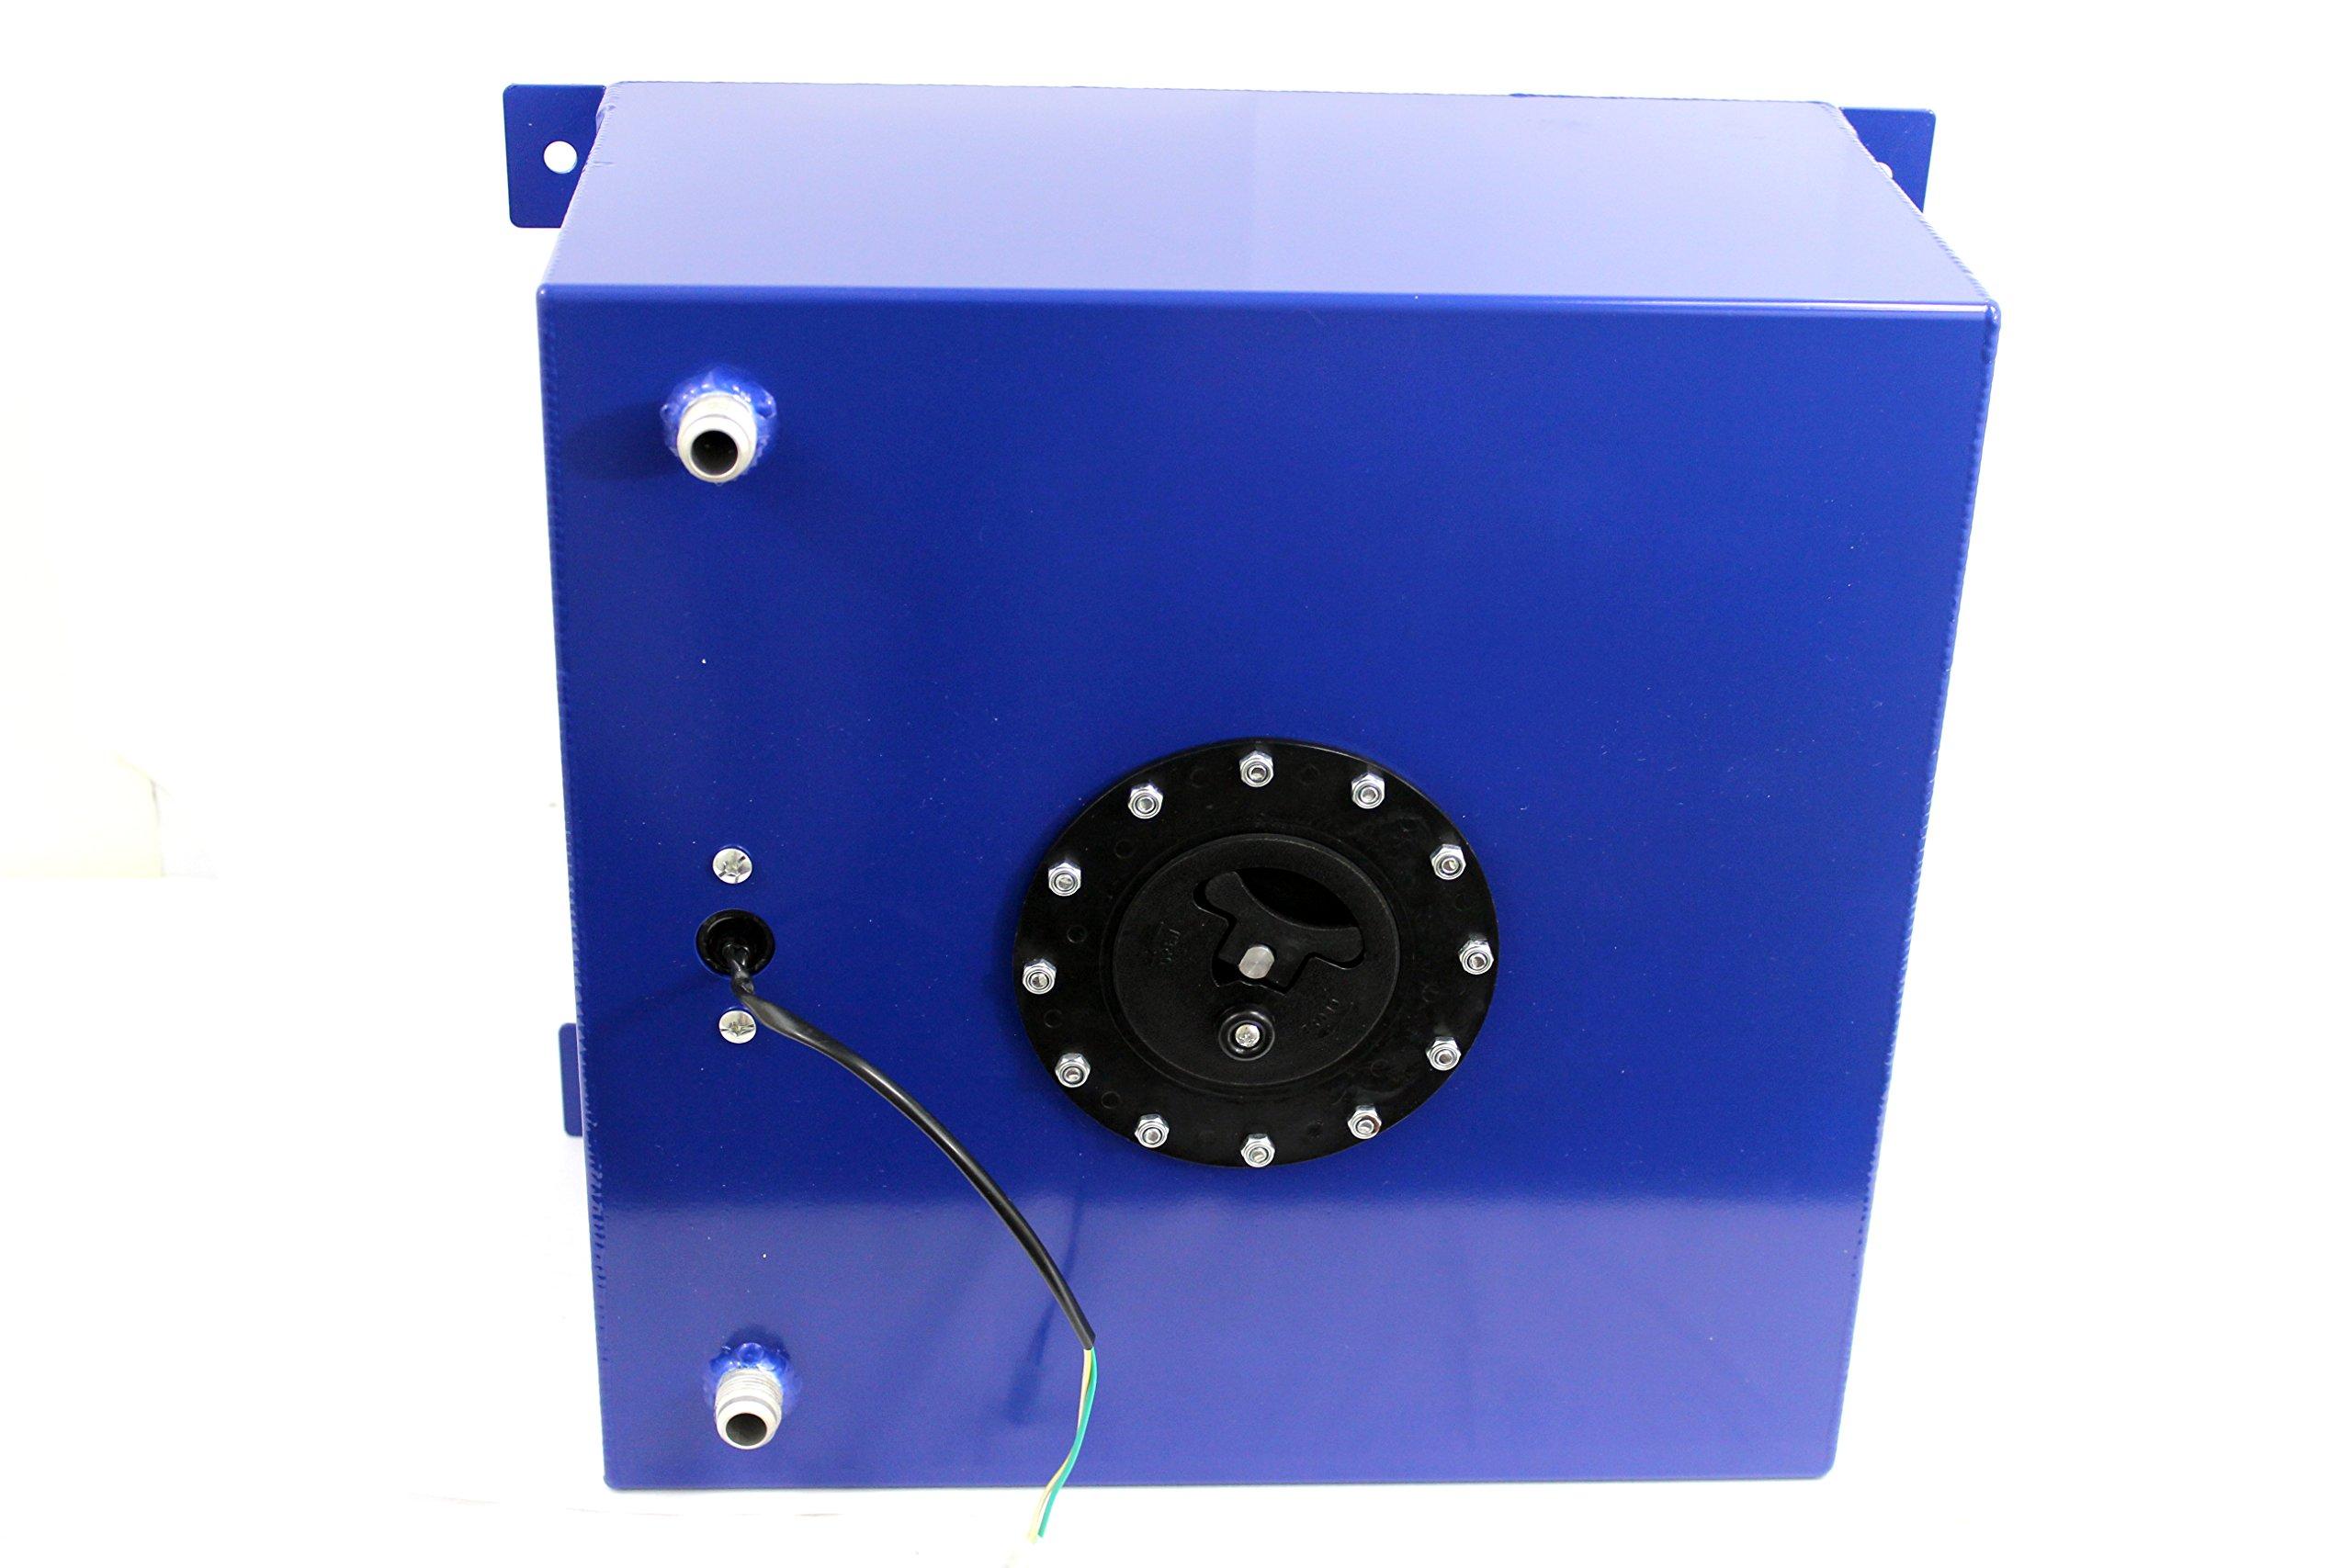 10 Gallon OEM Polished Aluminum Fuel Cell Gas Tank & Sender Hot Rod Rat Rod V8 Blue by DEMOTOR